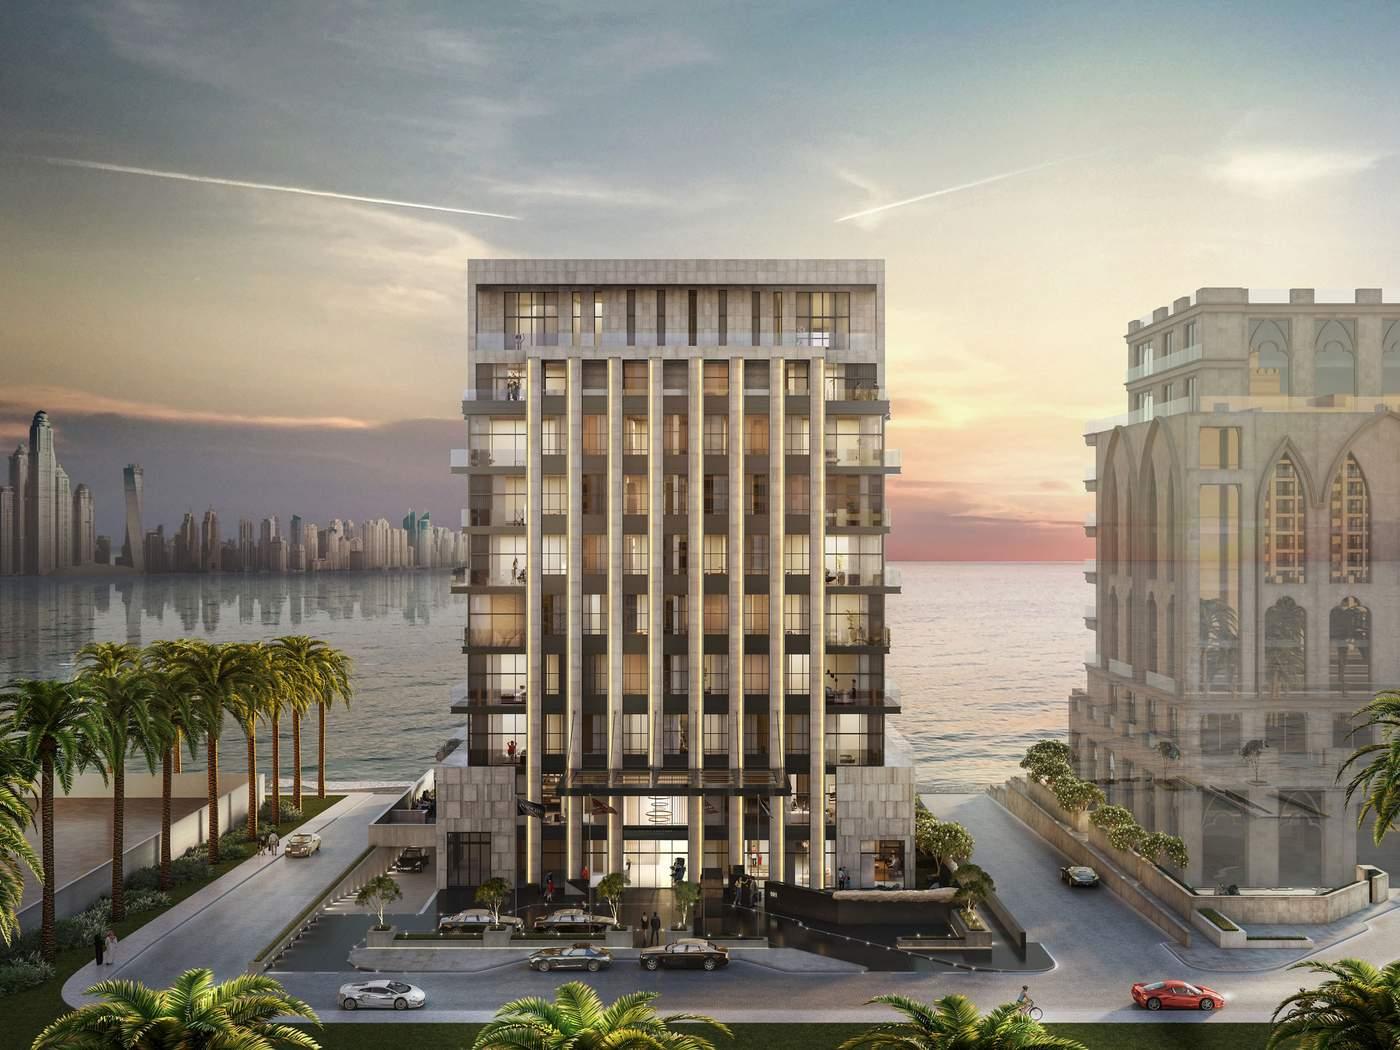 Ihram Kids For Sale Dubai: Waterfront Developments Flood Market In Dubaiundefined